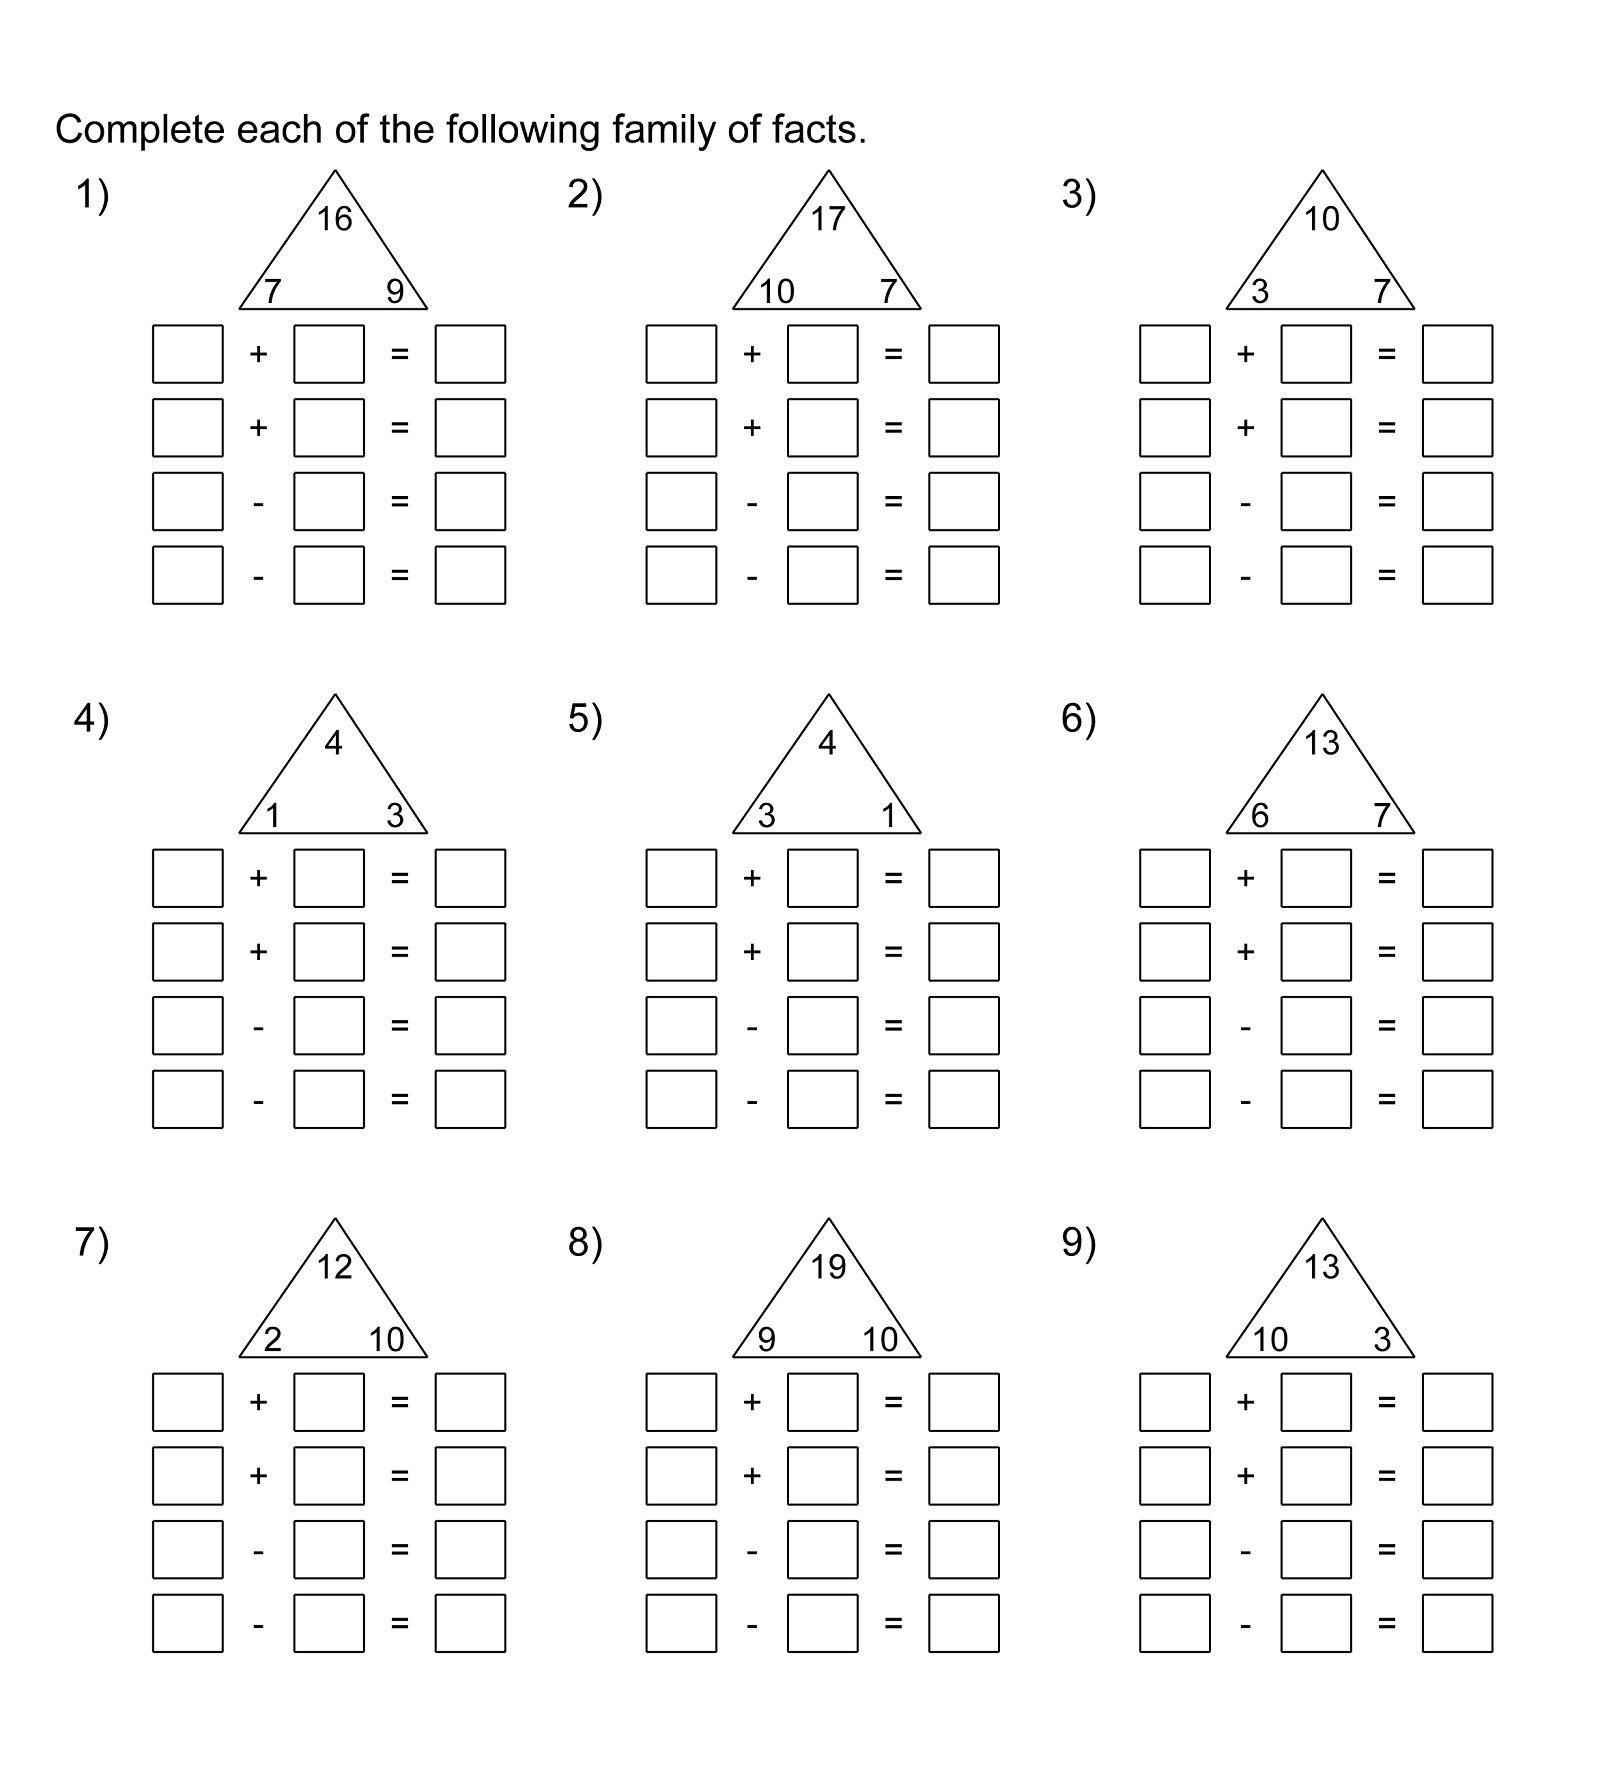 Fact Families Worksheets Printable   Fact family worksheet [ 1791 x 1600 Pixel ]